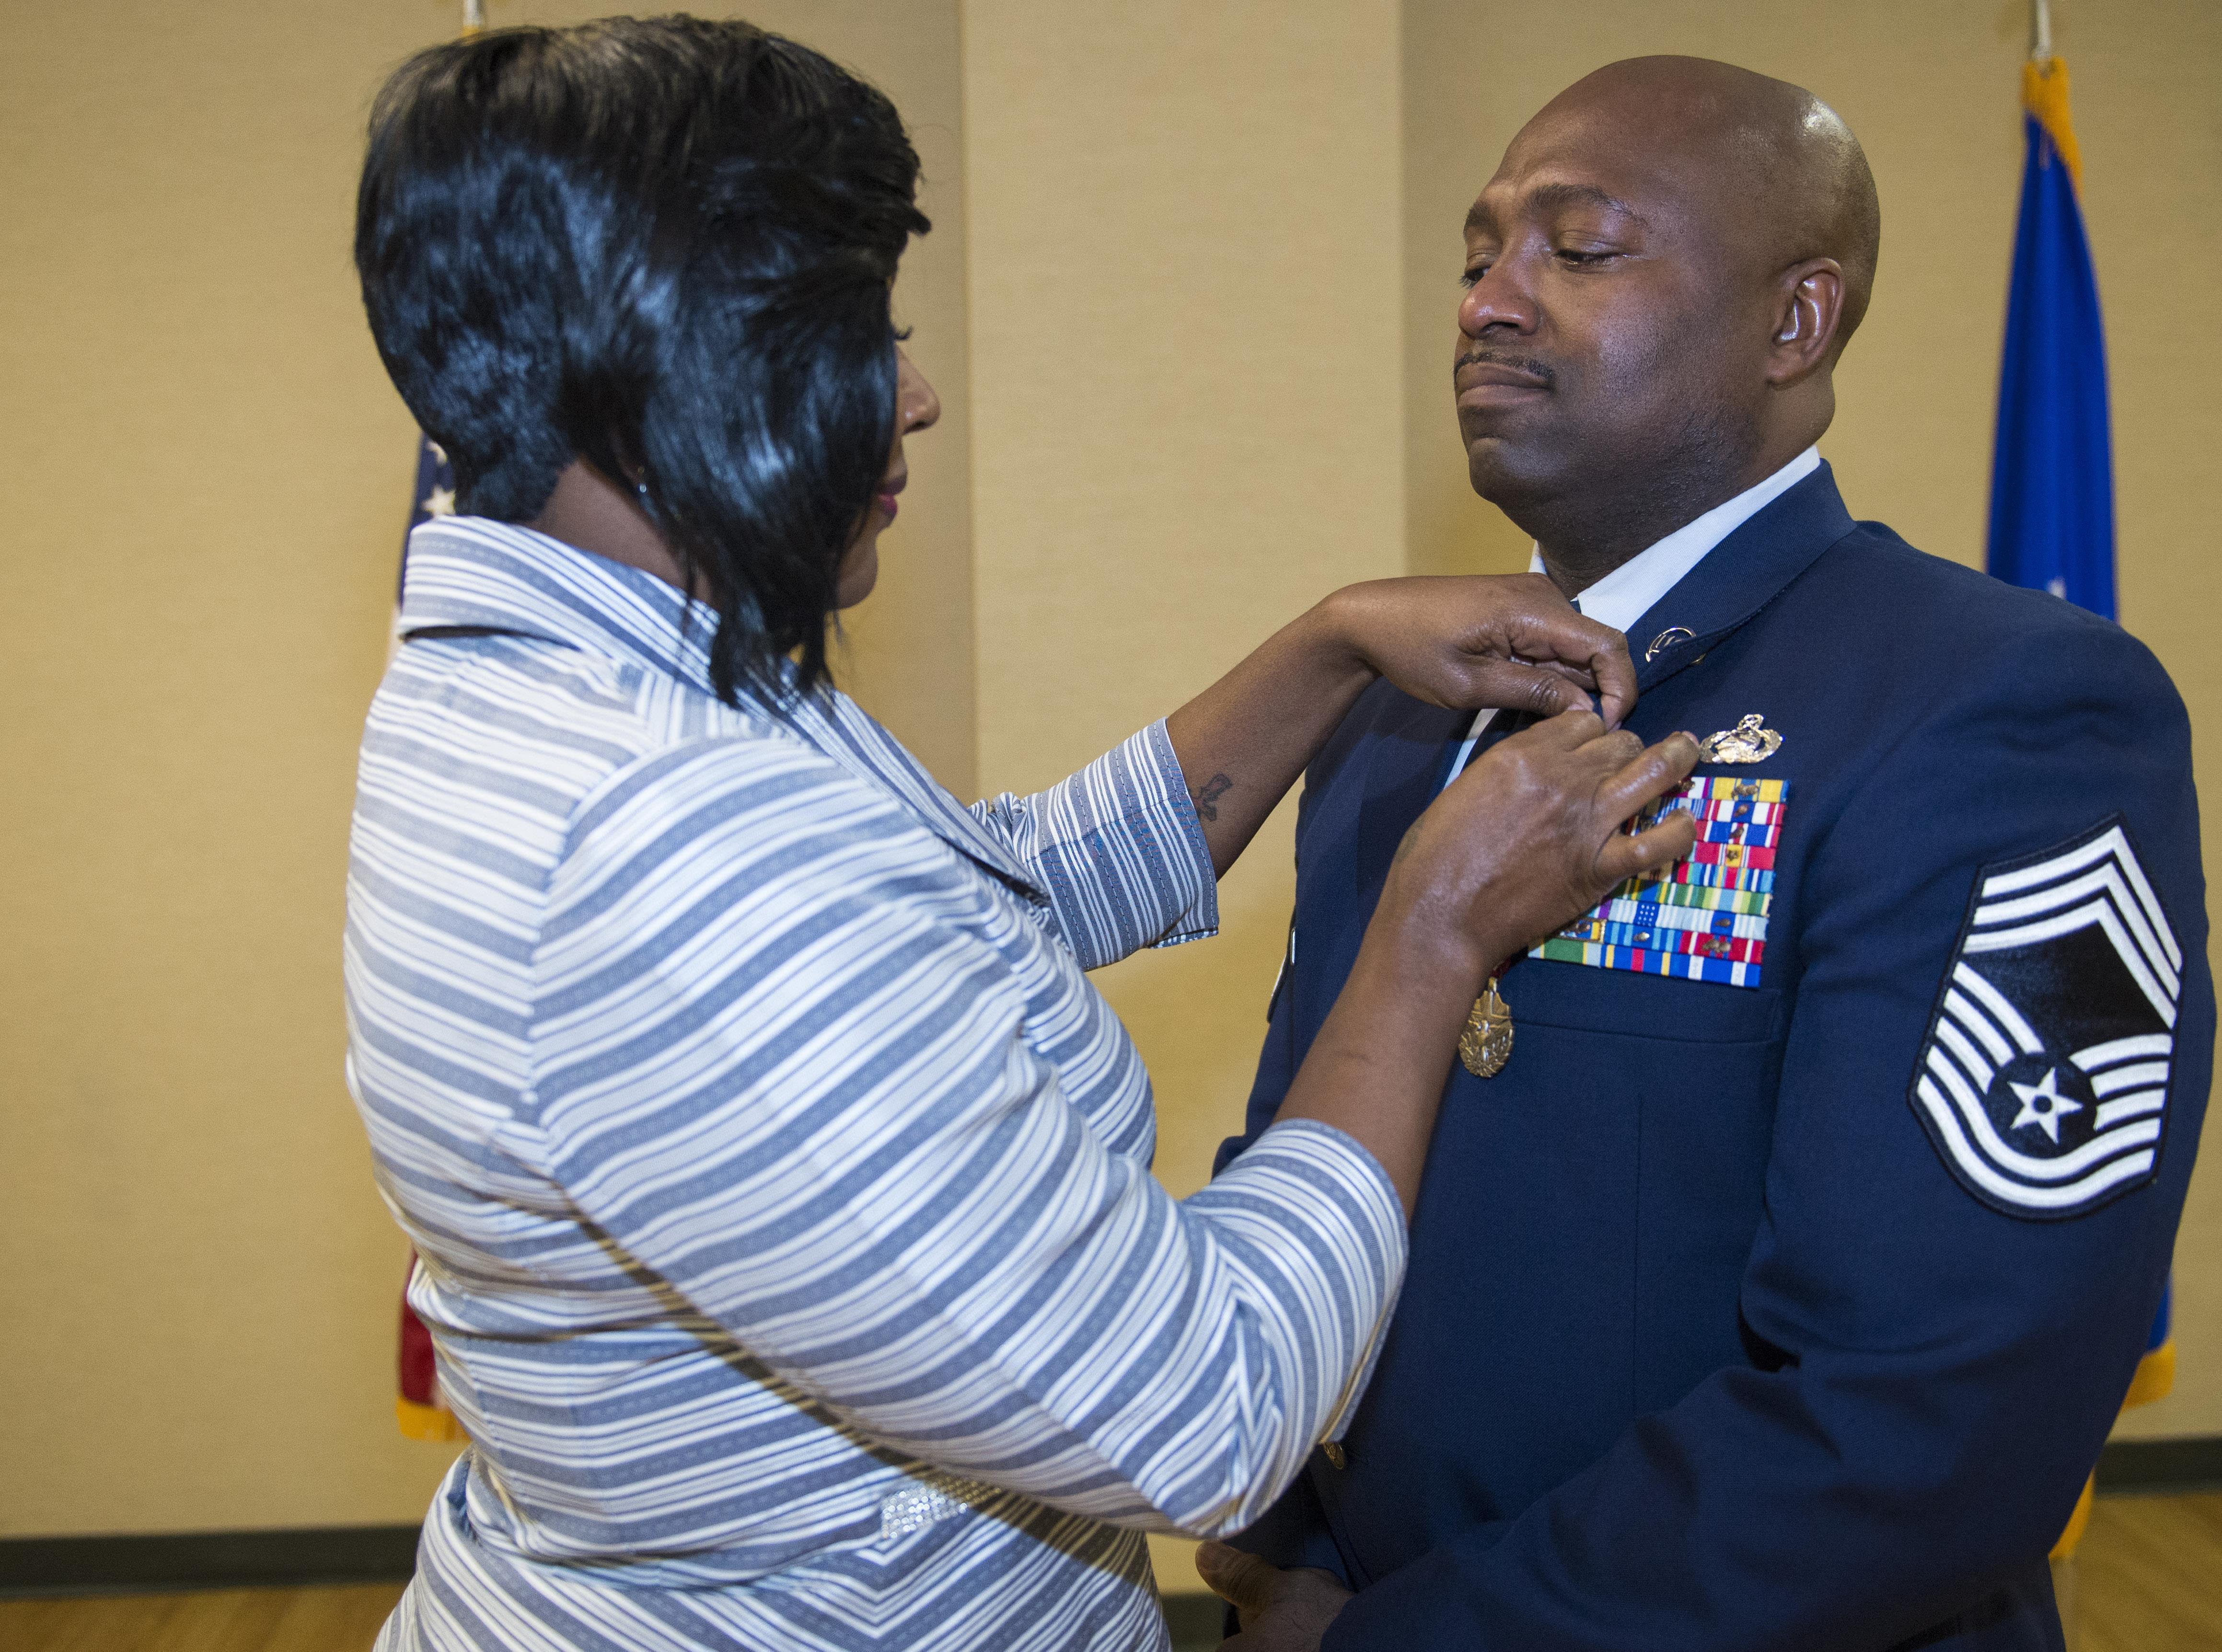 Photos teresa freeman wife of us air force chief master sgt samuel freeman 23d publicscrutiny Choice Image